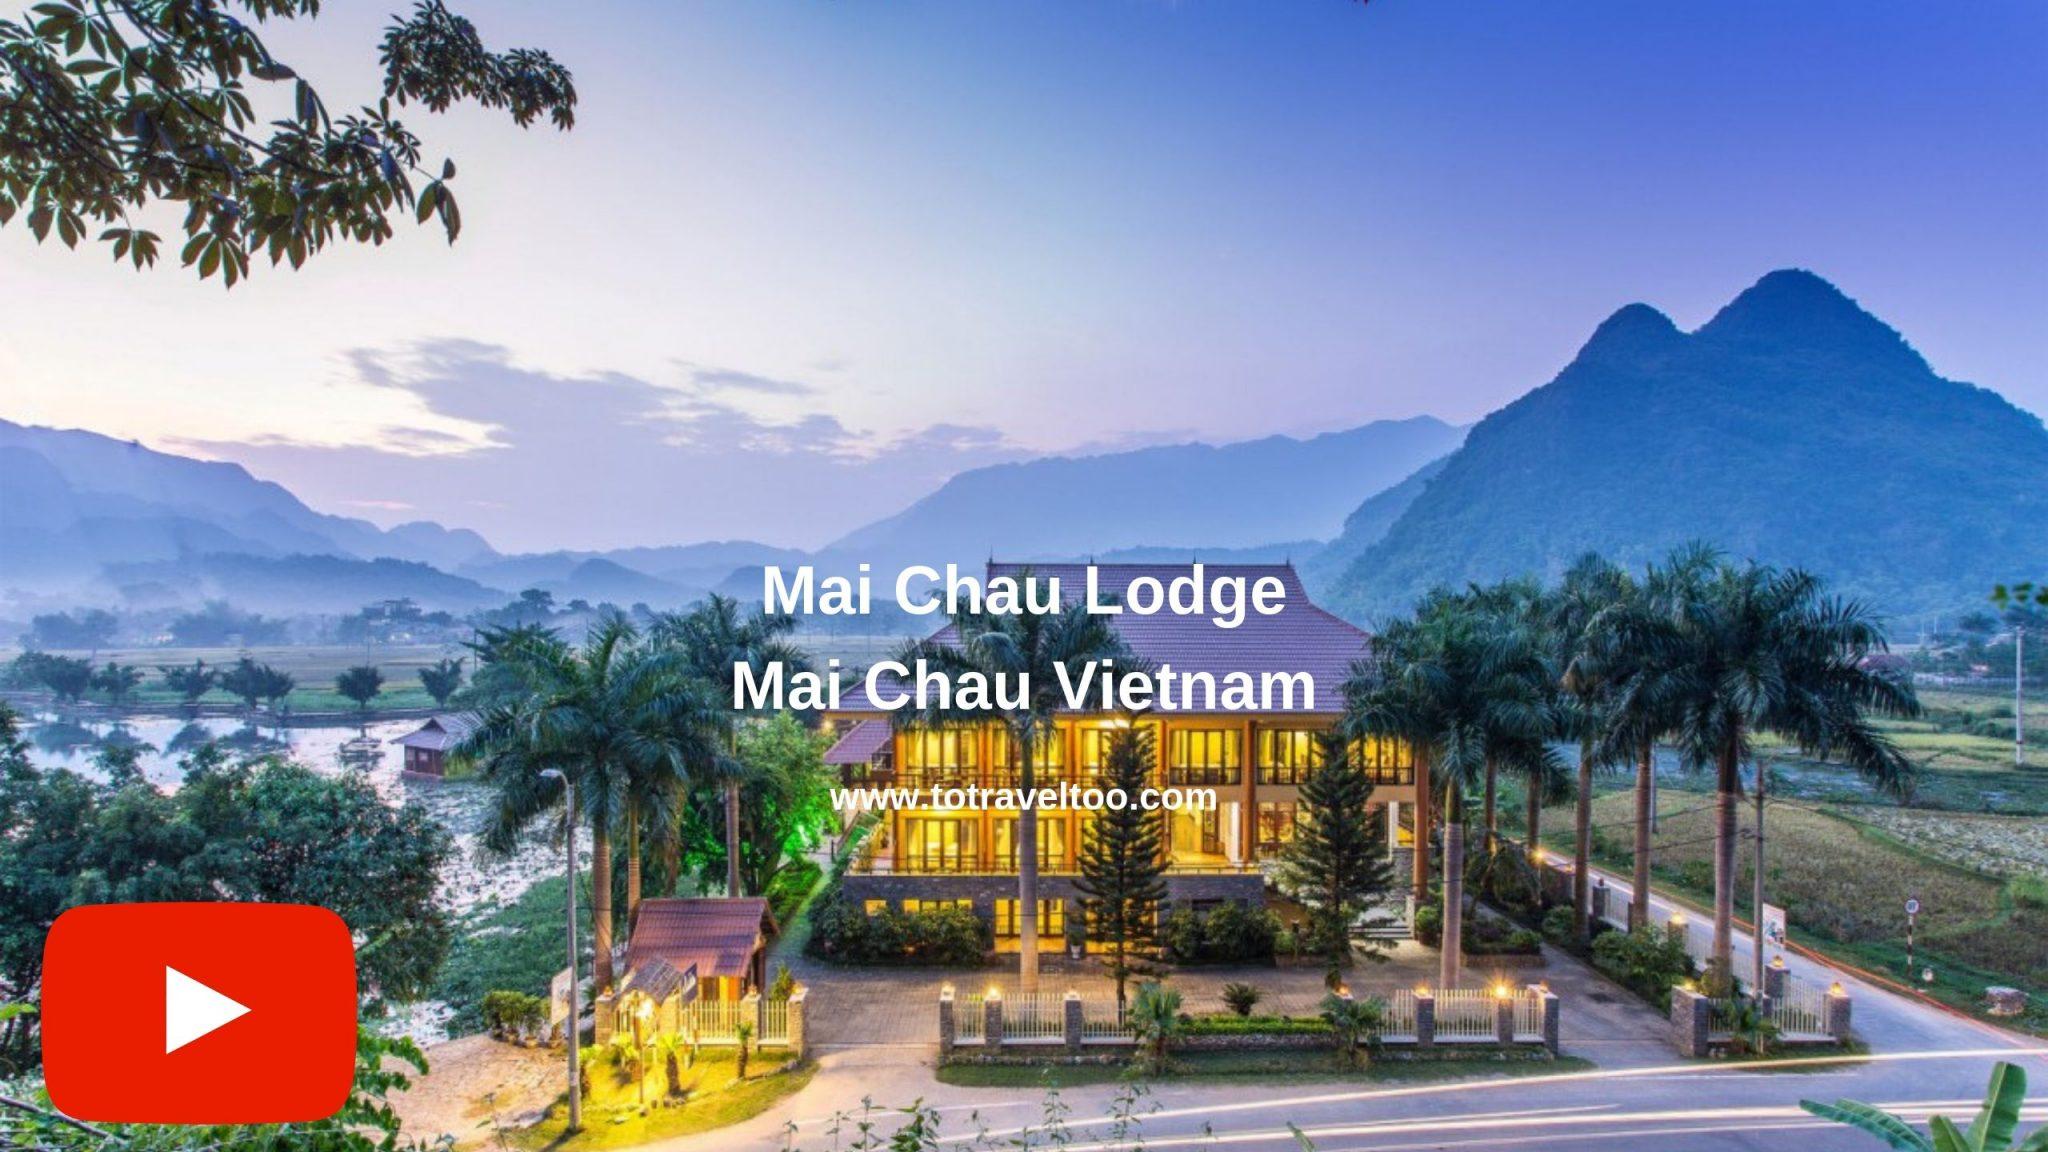 Guide to Mai Chau Vietnam Youtube video on Mai Chau Lodge